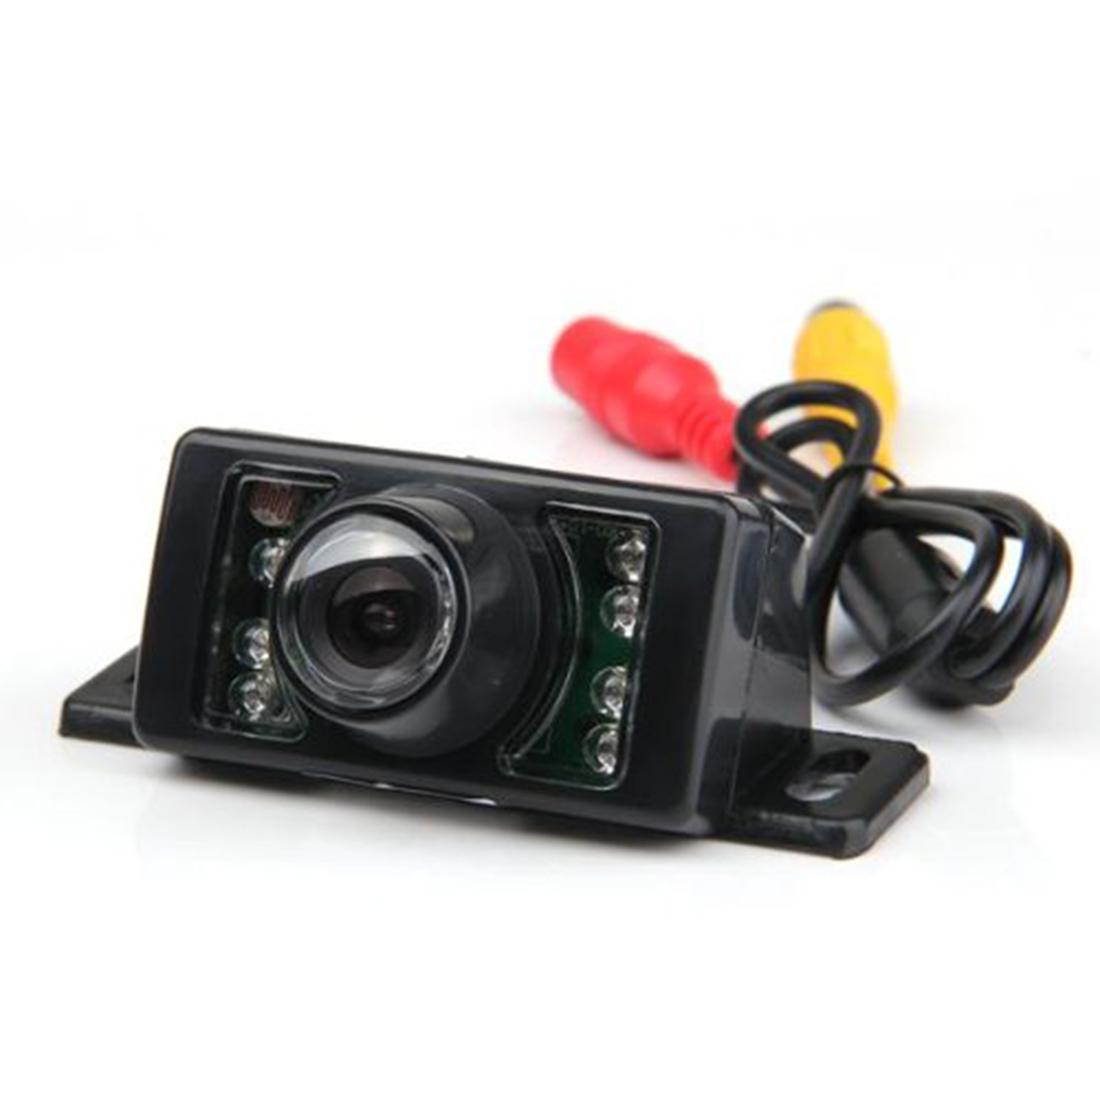 Night Vision CMOS Back Up Reverse Wide Angle Car Vehicle Color Rear View Camera Free Shipping(China (Mainland))